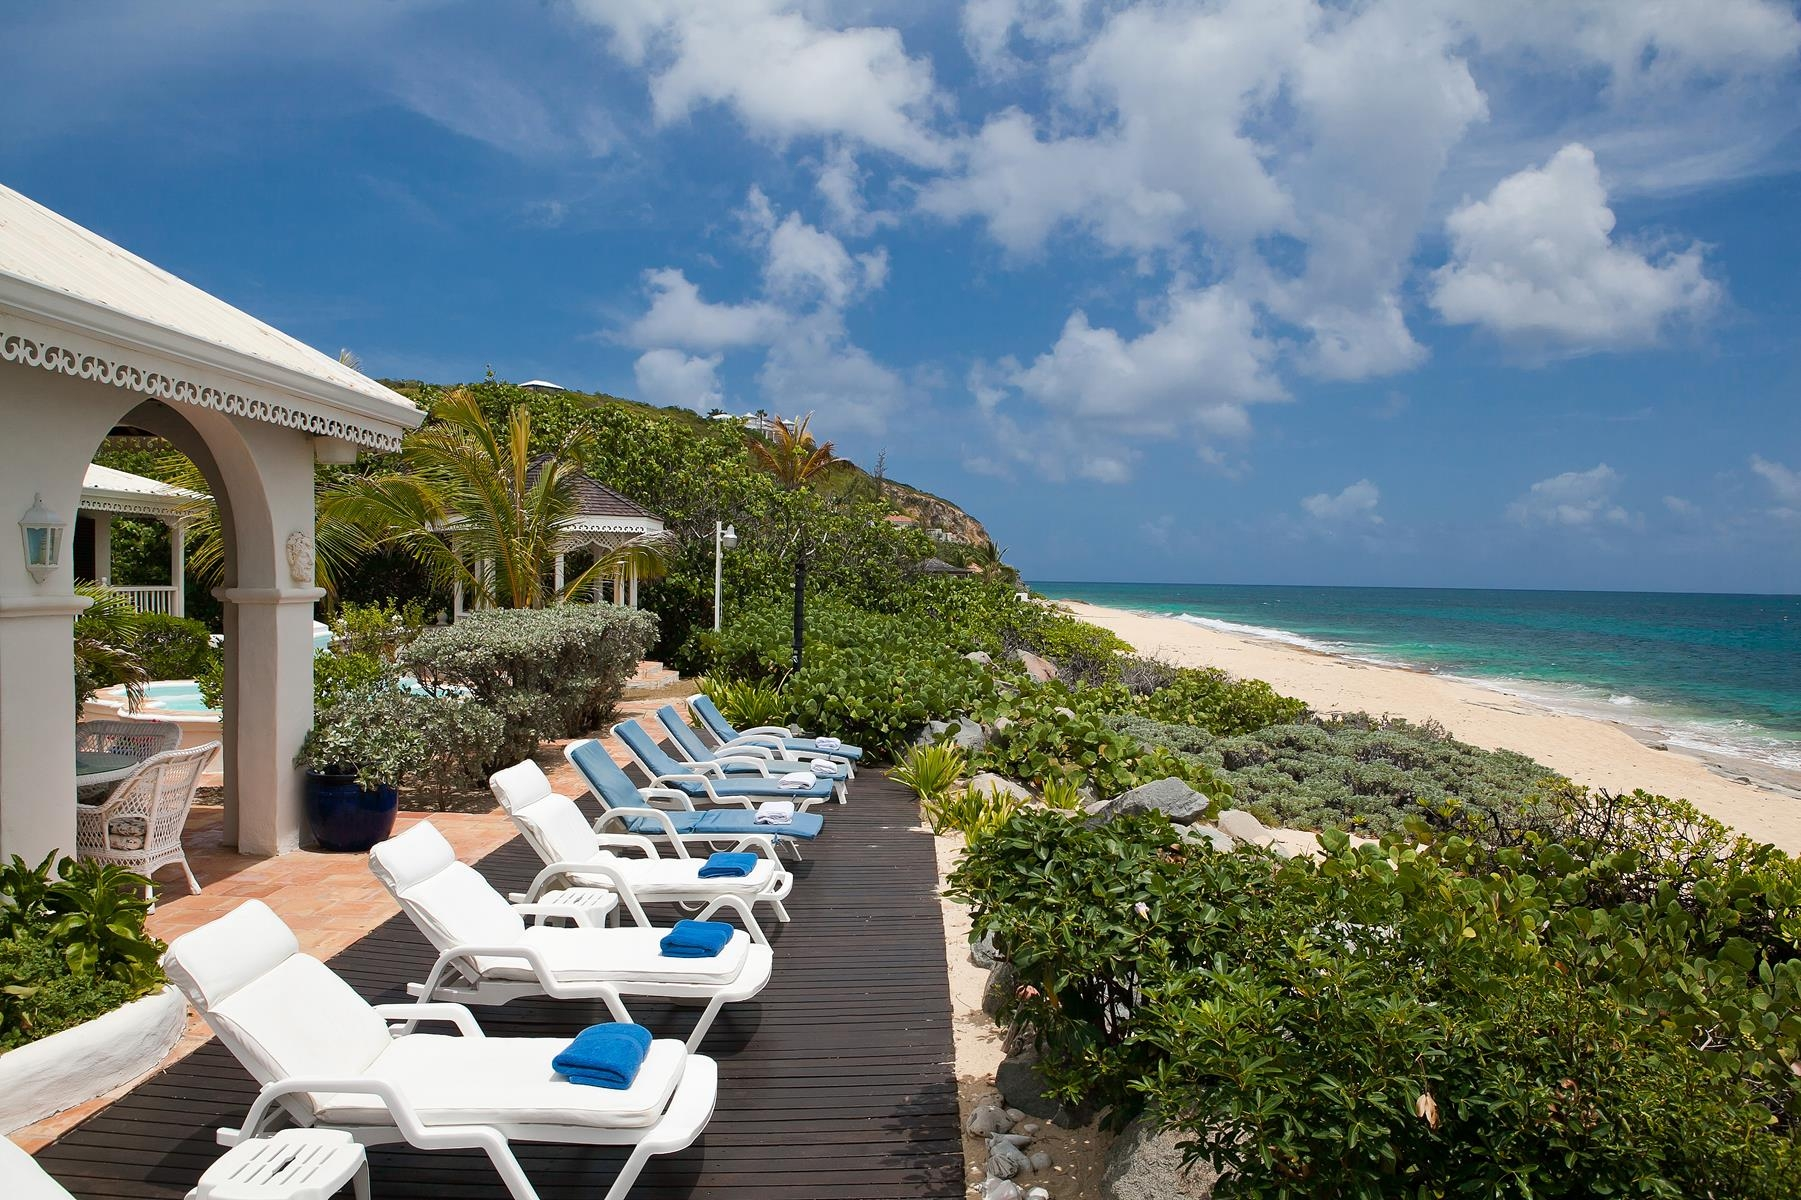 Luxury villa rentals caribbean - St martin - Saint martin french - Les terres basses - La Mission - Image 1/30